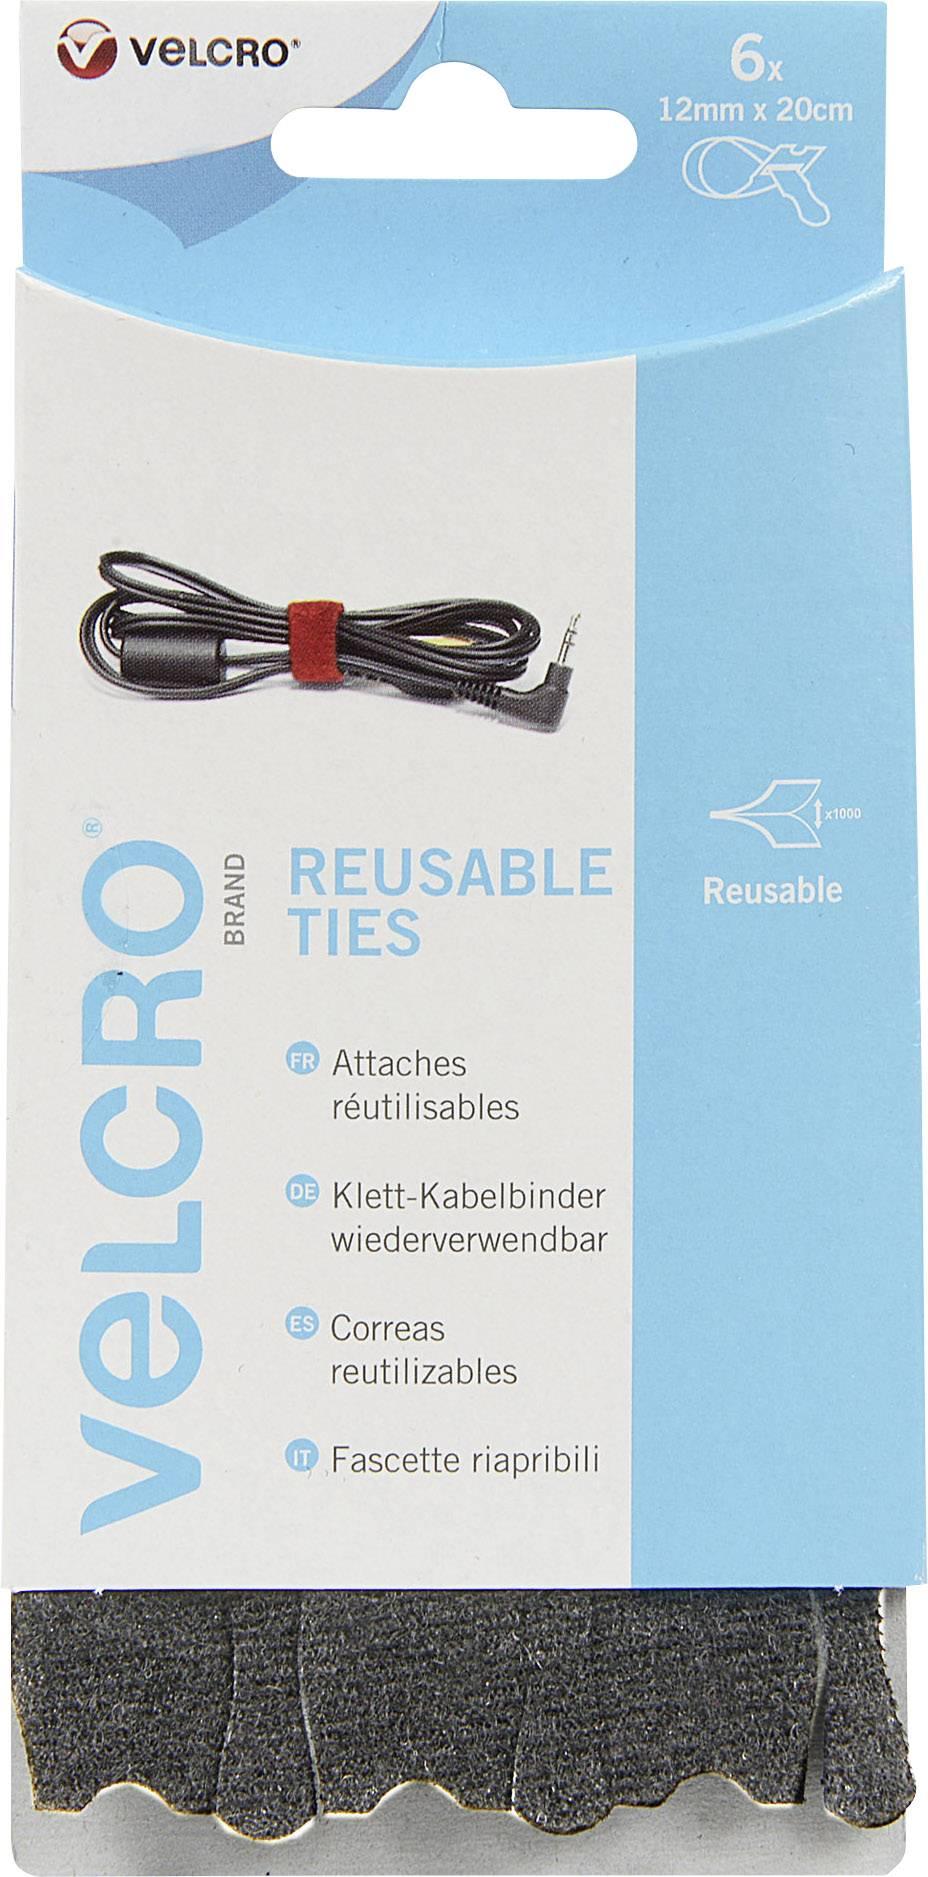 Káblový manažér na suchý zips VELCRO® brand VEL-EC60388, (d x š) 200 mm x 12 mm, čierna, 6 ks